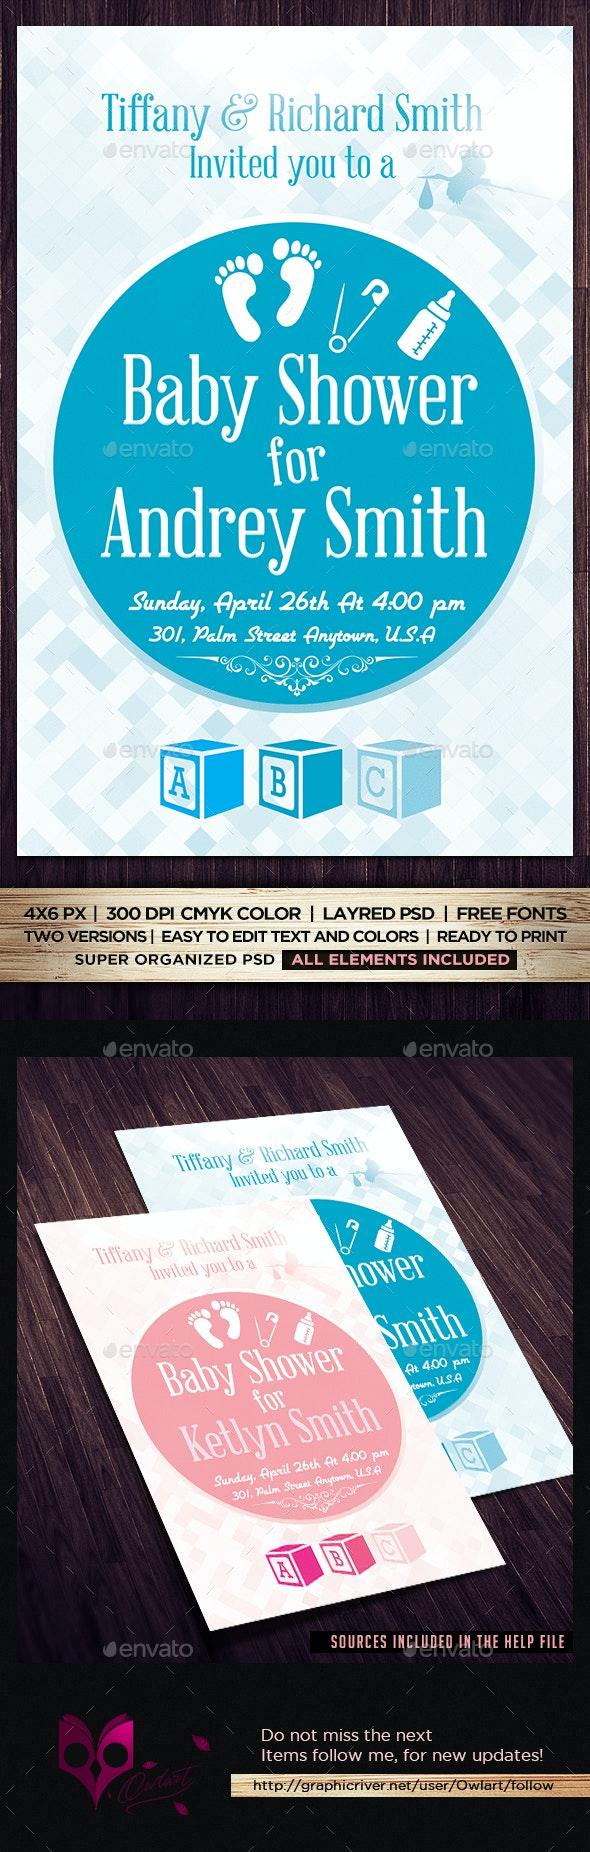 Baby Shower Invitatin Flyer - Flyers Print Templates